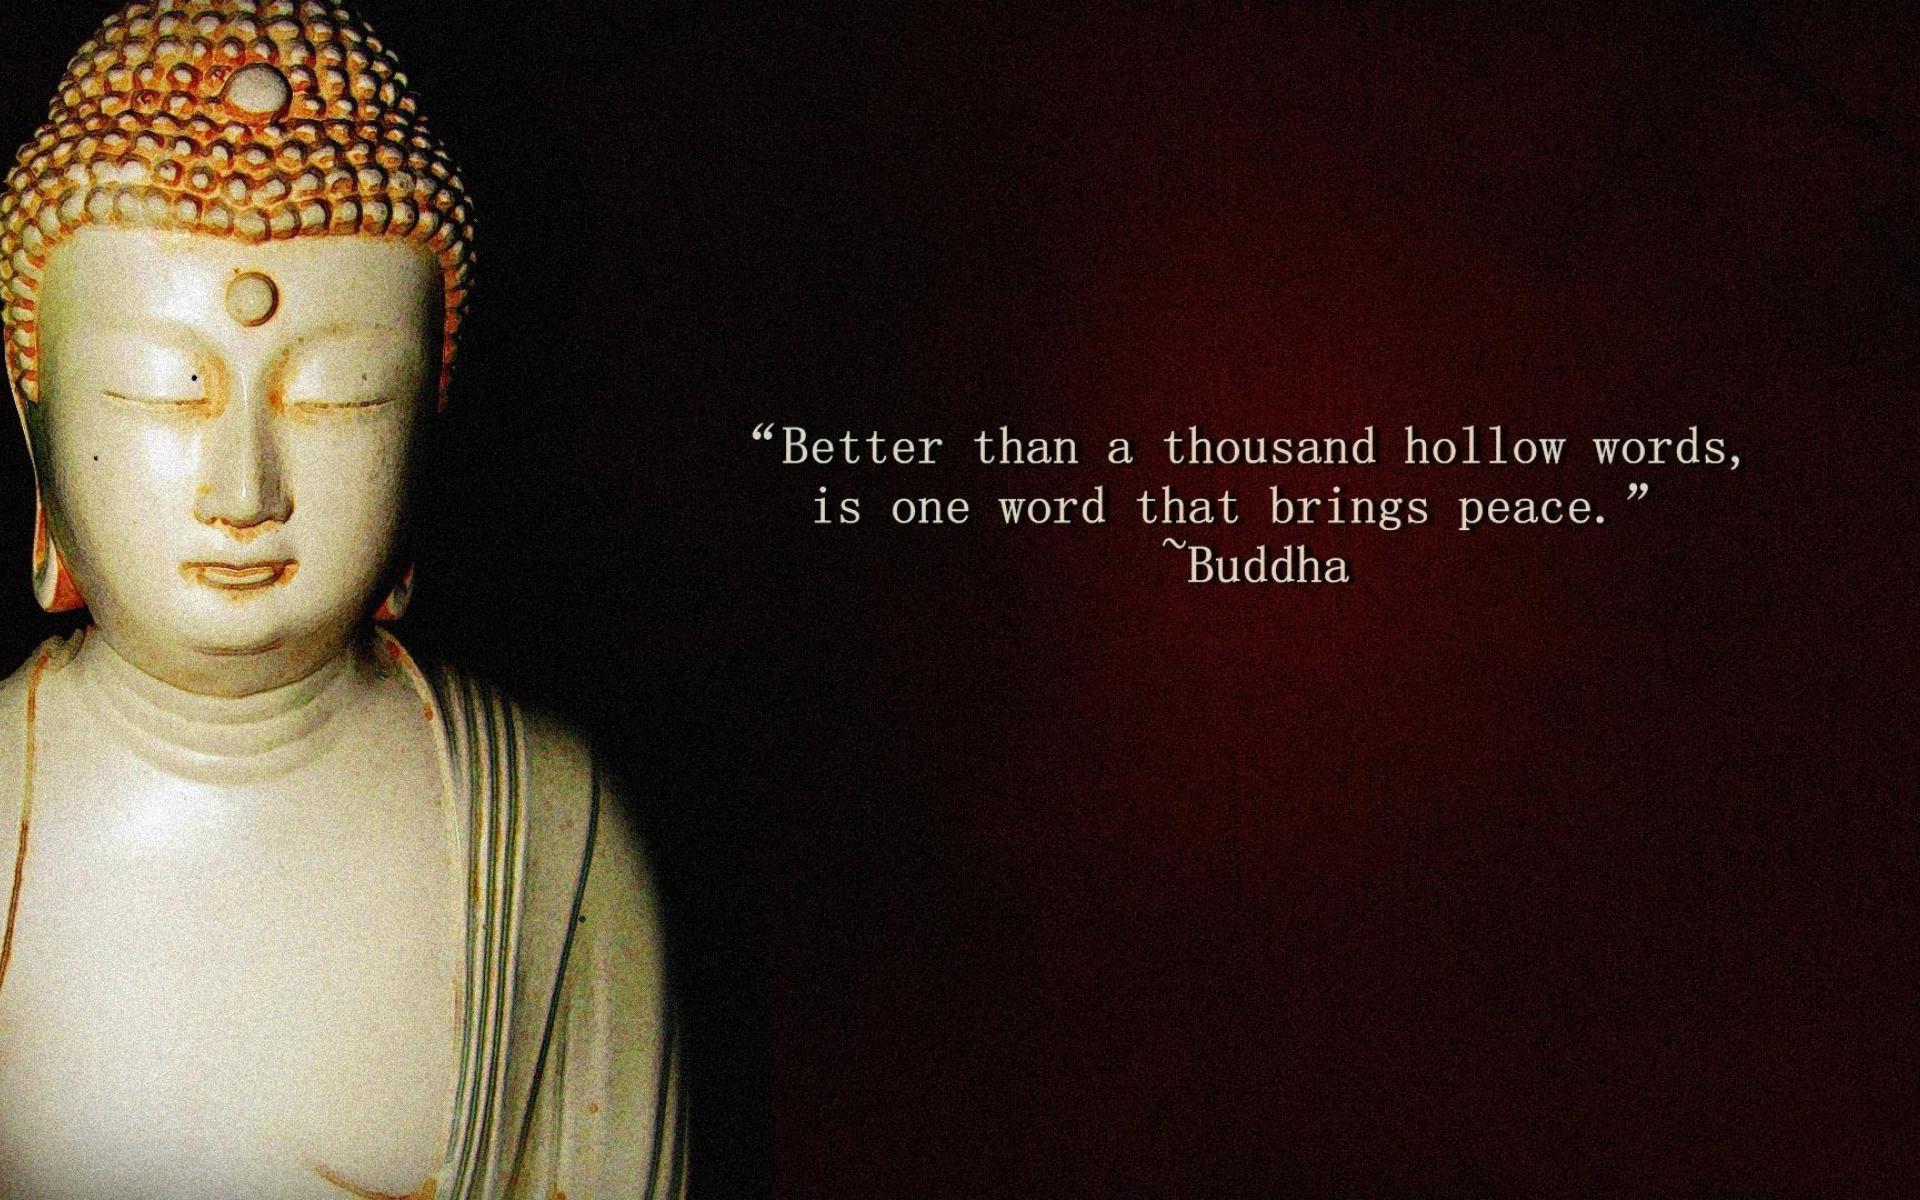 buddhist-art-qoute-Typography-Buddha-Digital-Buddha-quote-Statue-Art-Quote-HD-wallpaper-wp3803490